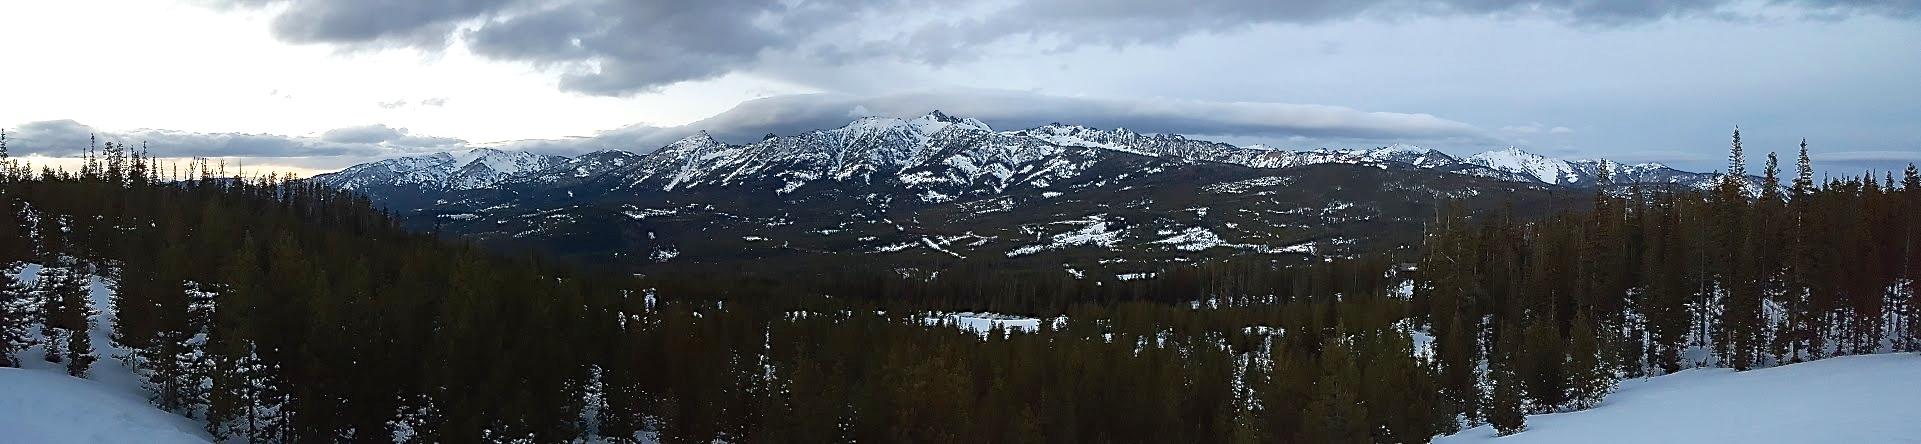 Ski Trip Big Sky, Montana March 2017